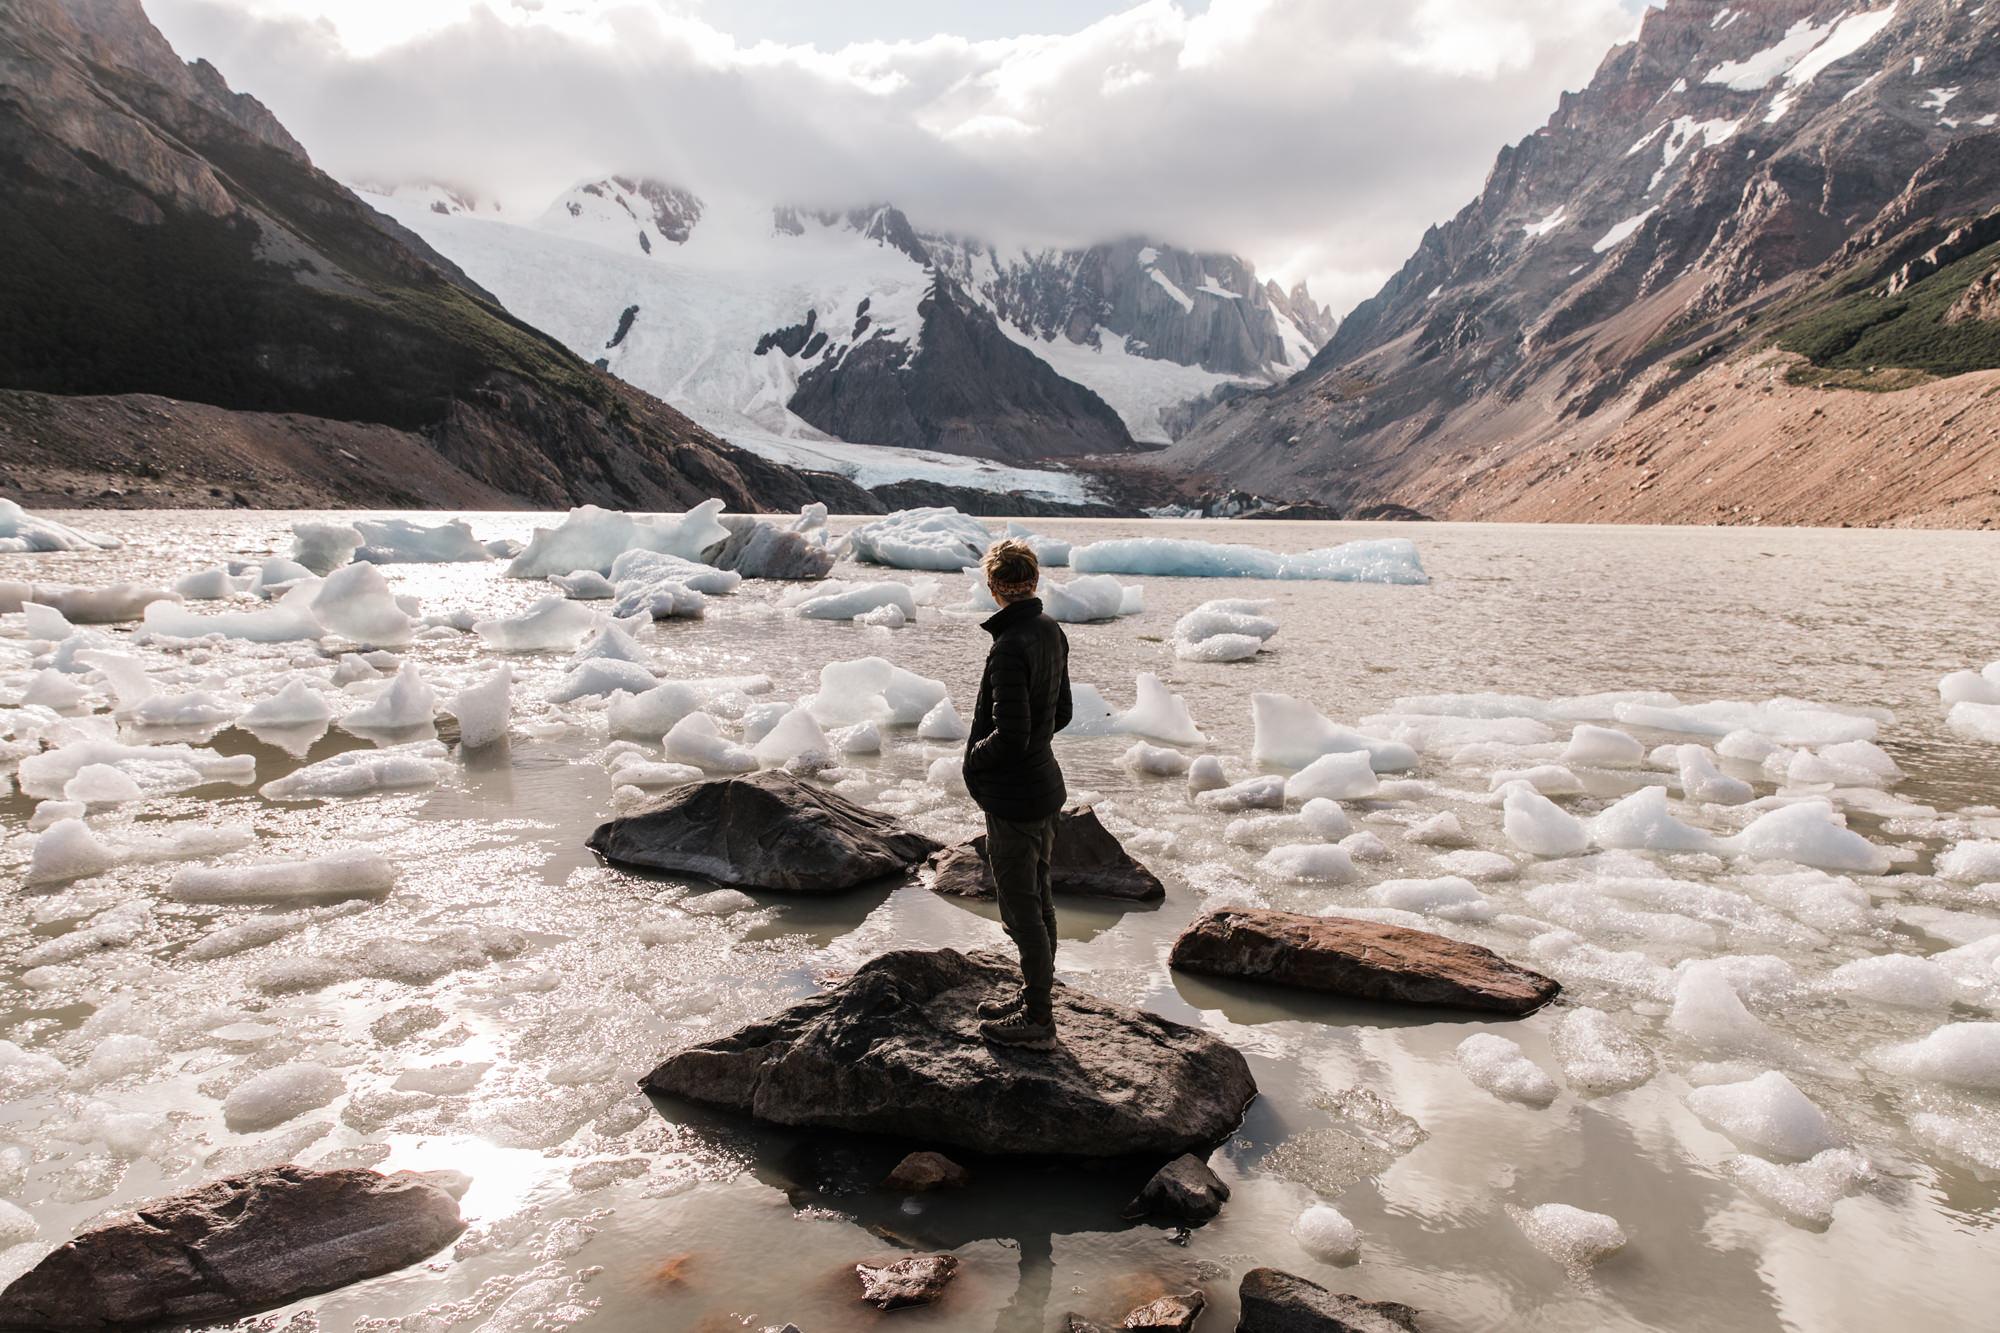 backpacking near cerro torre in Patagonia | campo de augostini +lago torre iceberg lagoon | adventure elopement inspiration | the hearnes adventure photography